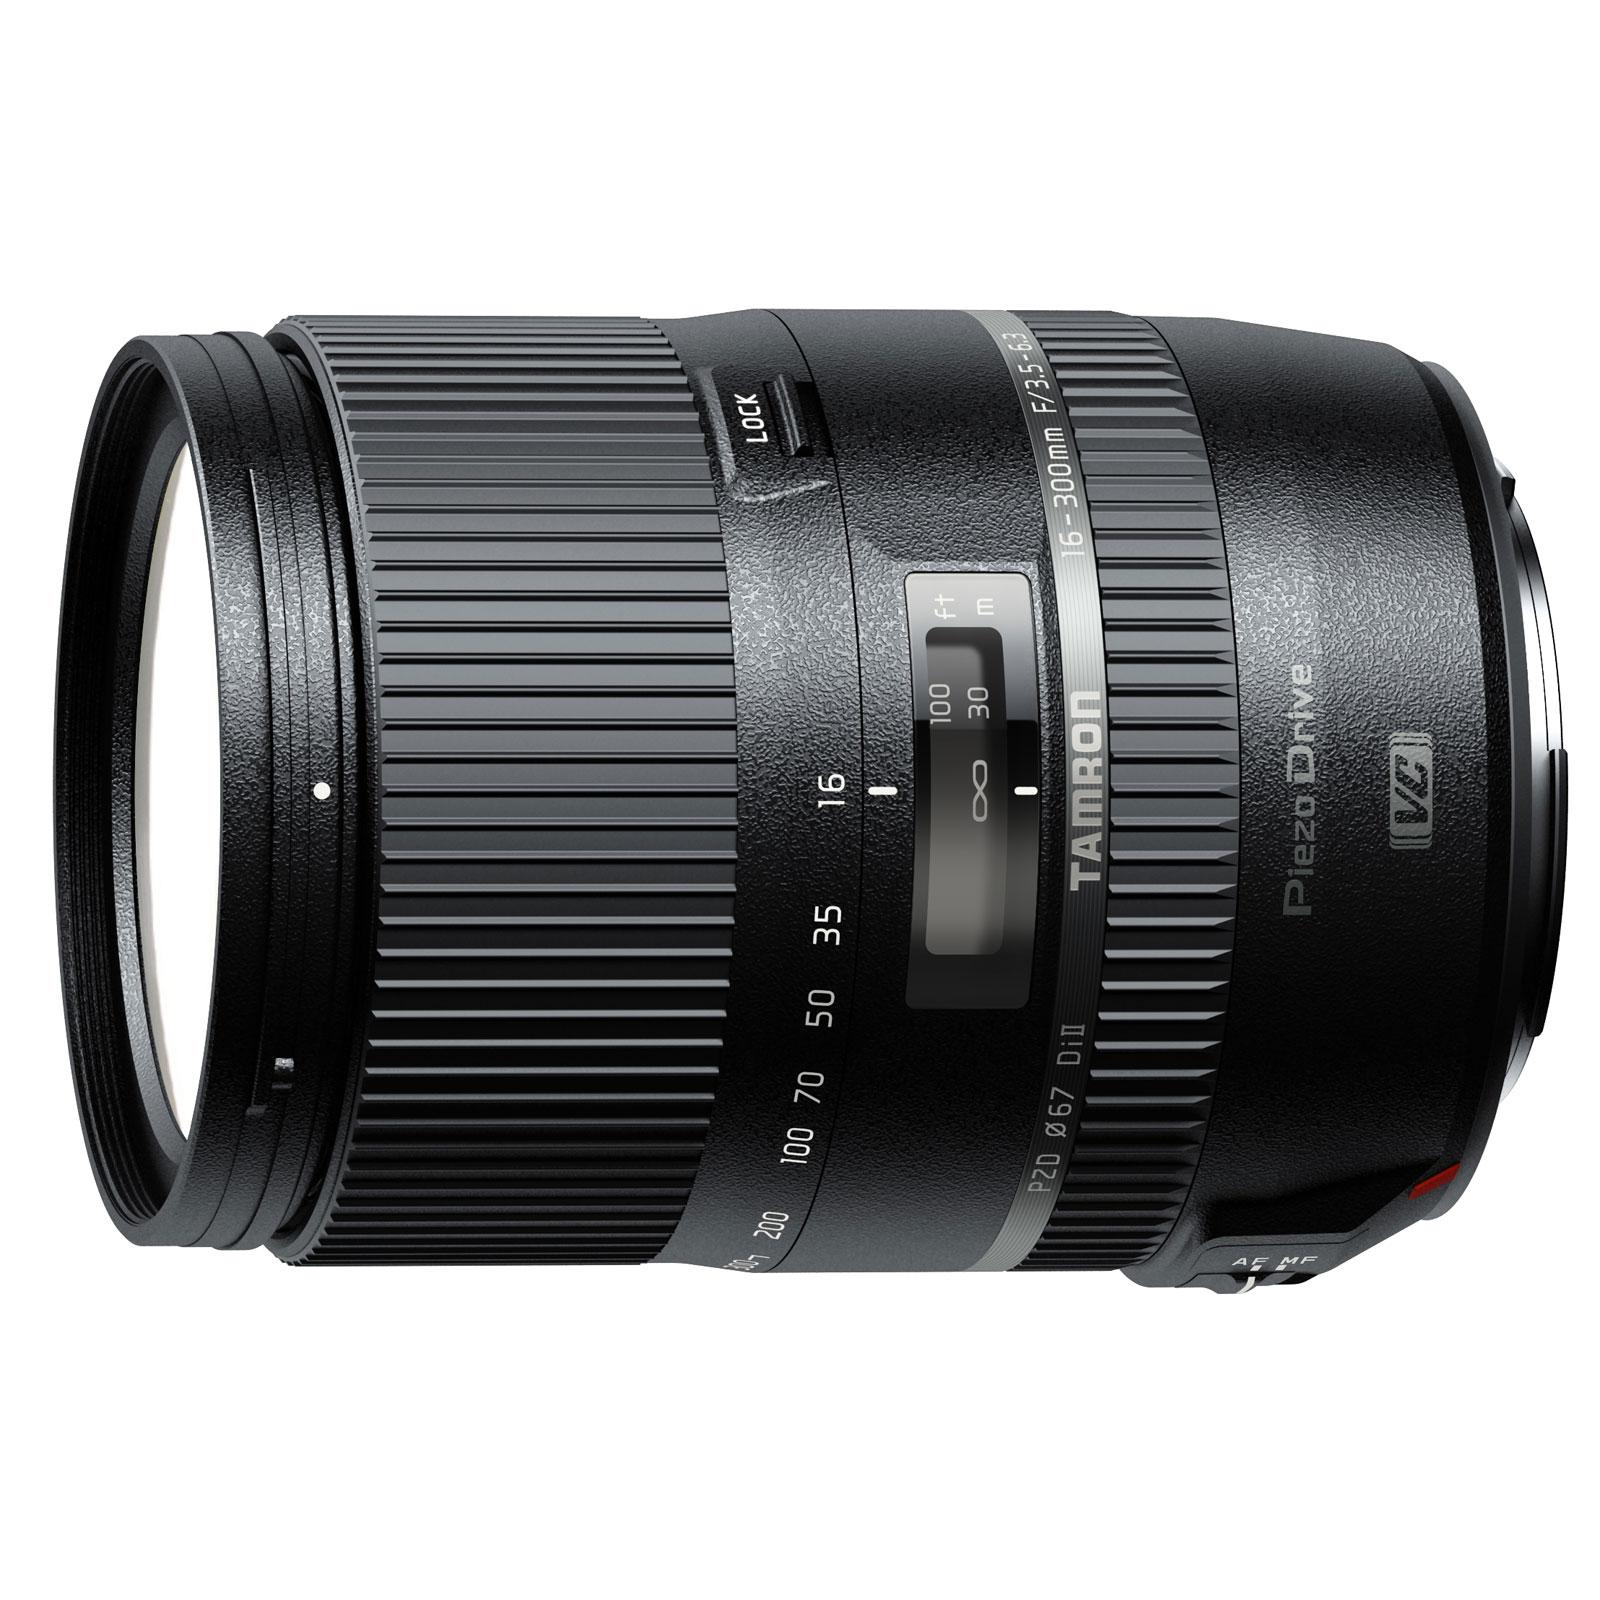 Objectif appareil photo Tamron 16-300MM F3.5-6.3 DI II VC PZD Macro monture Nikon Mégazoom stabilisé haute performance